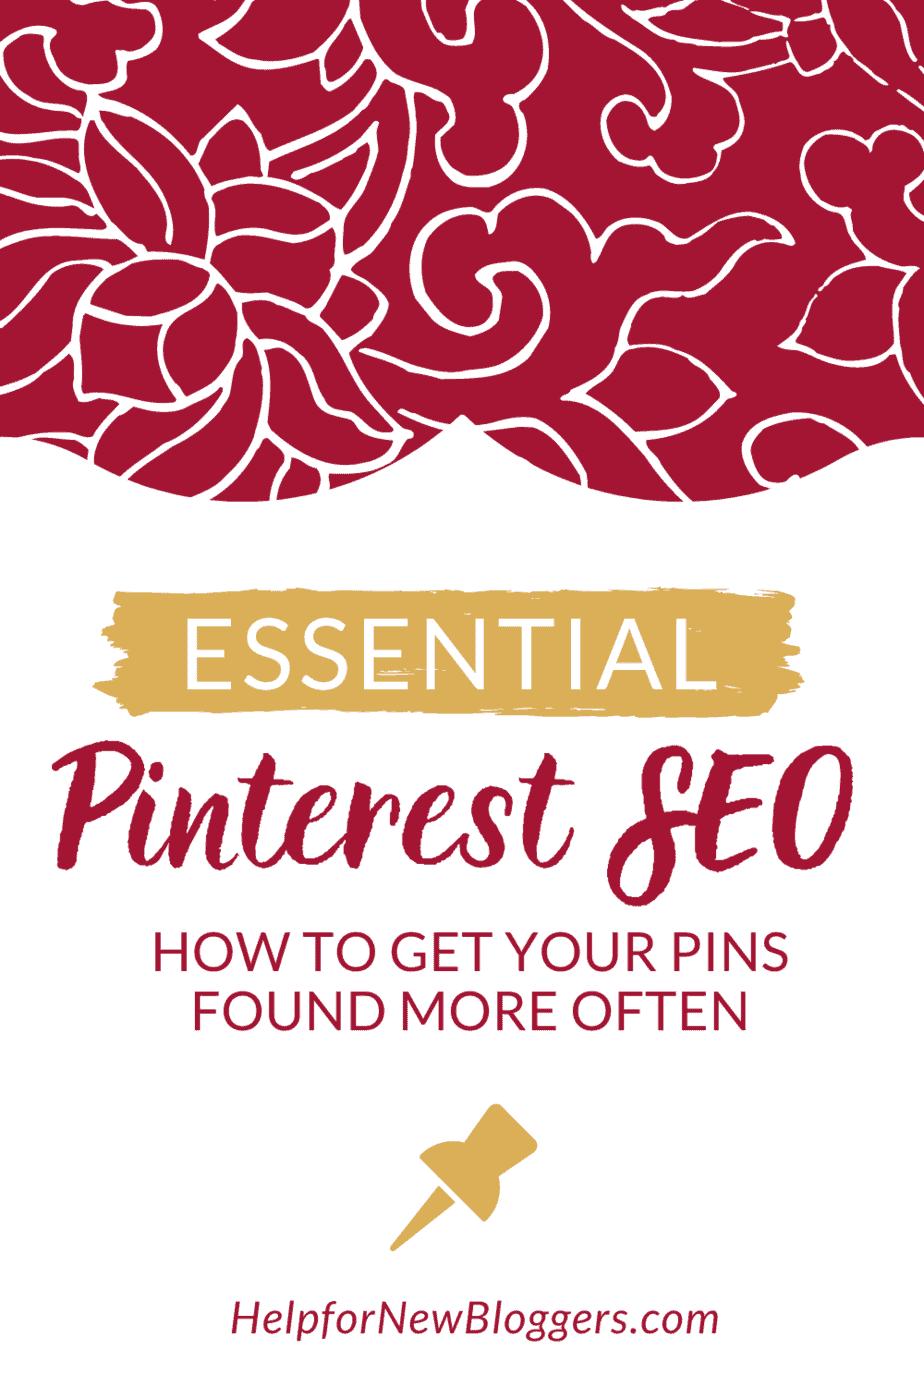 Essential Pinterest SEO strategy